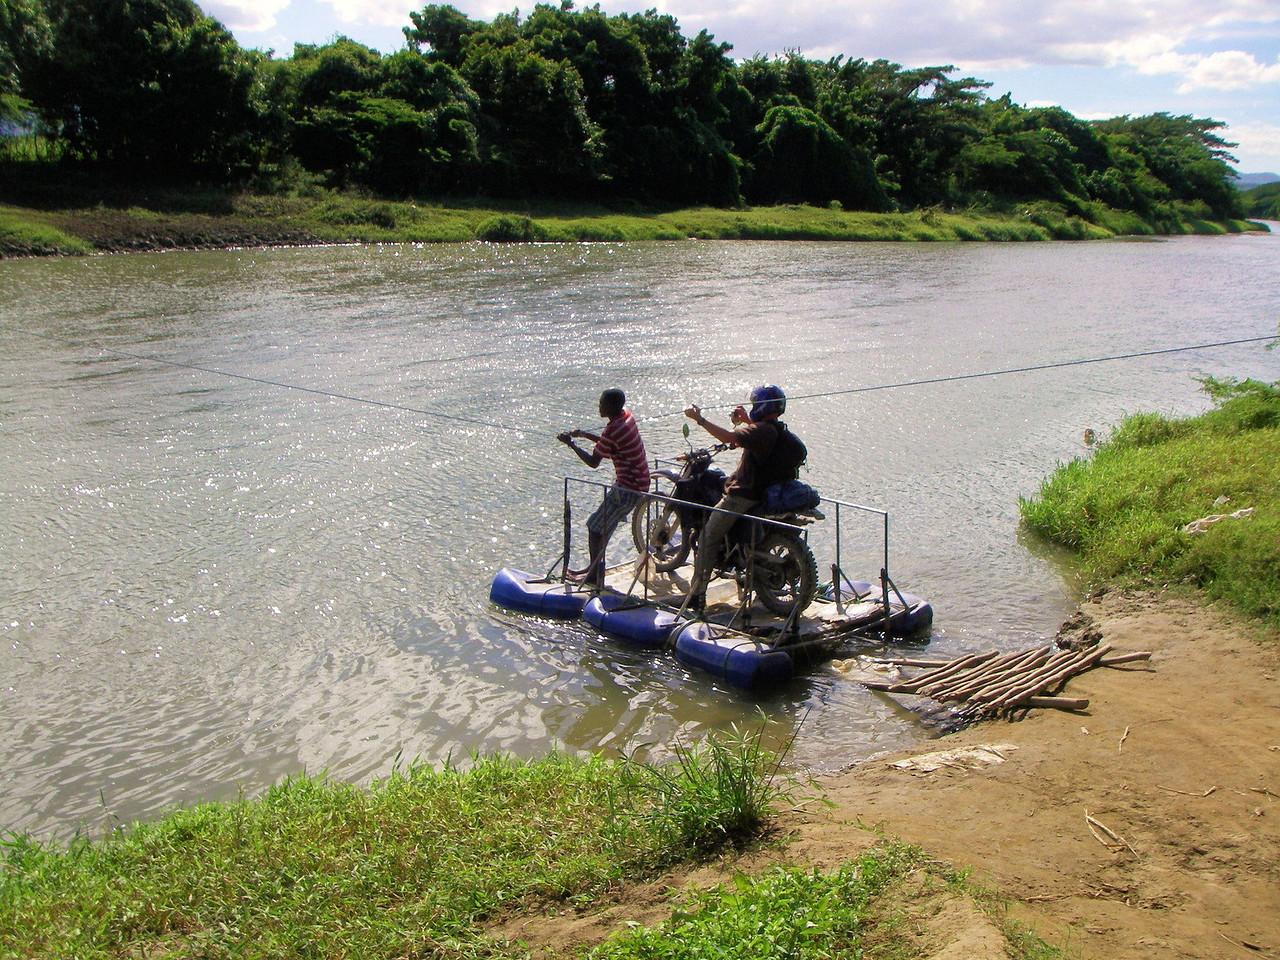 Water crossing in rural Dominican Republic